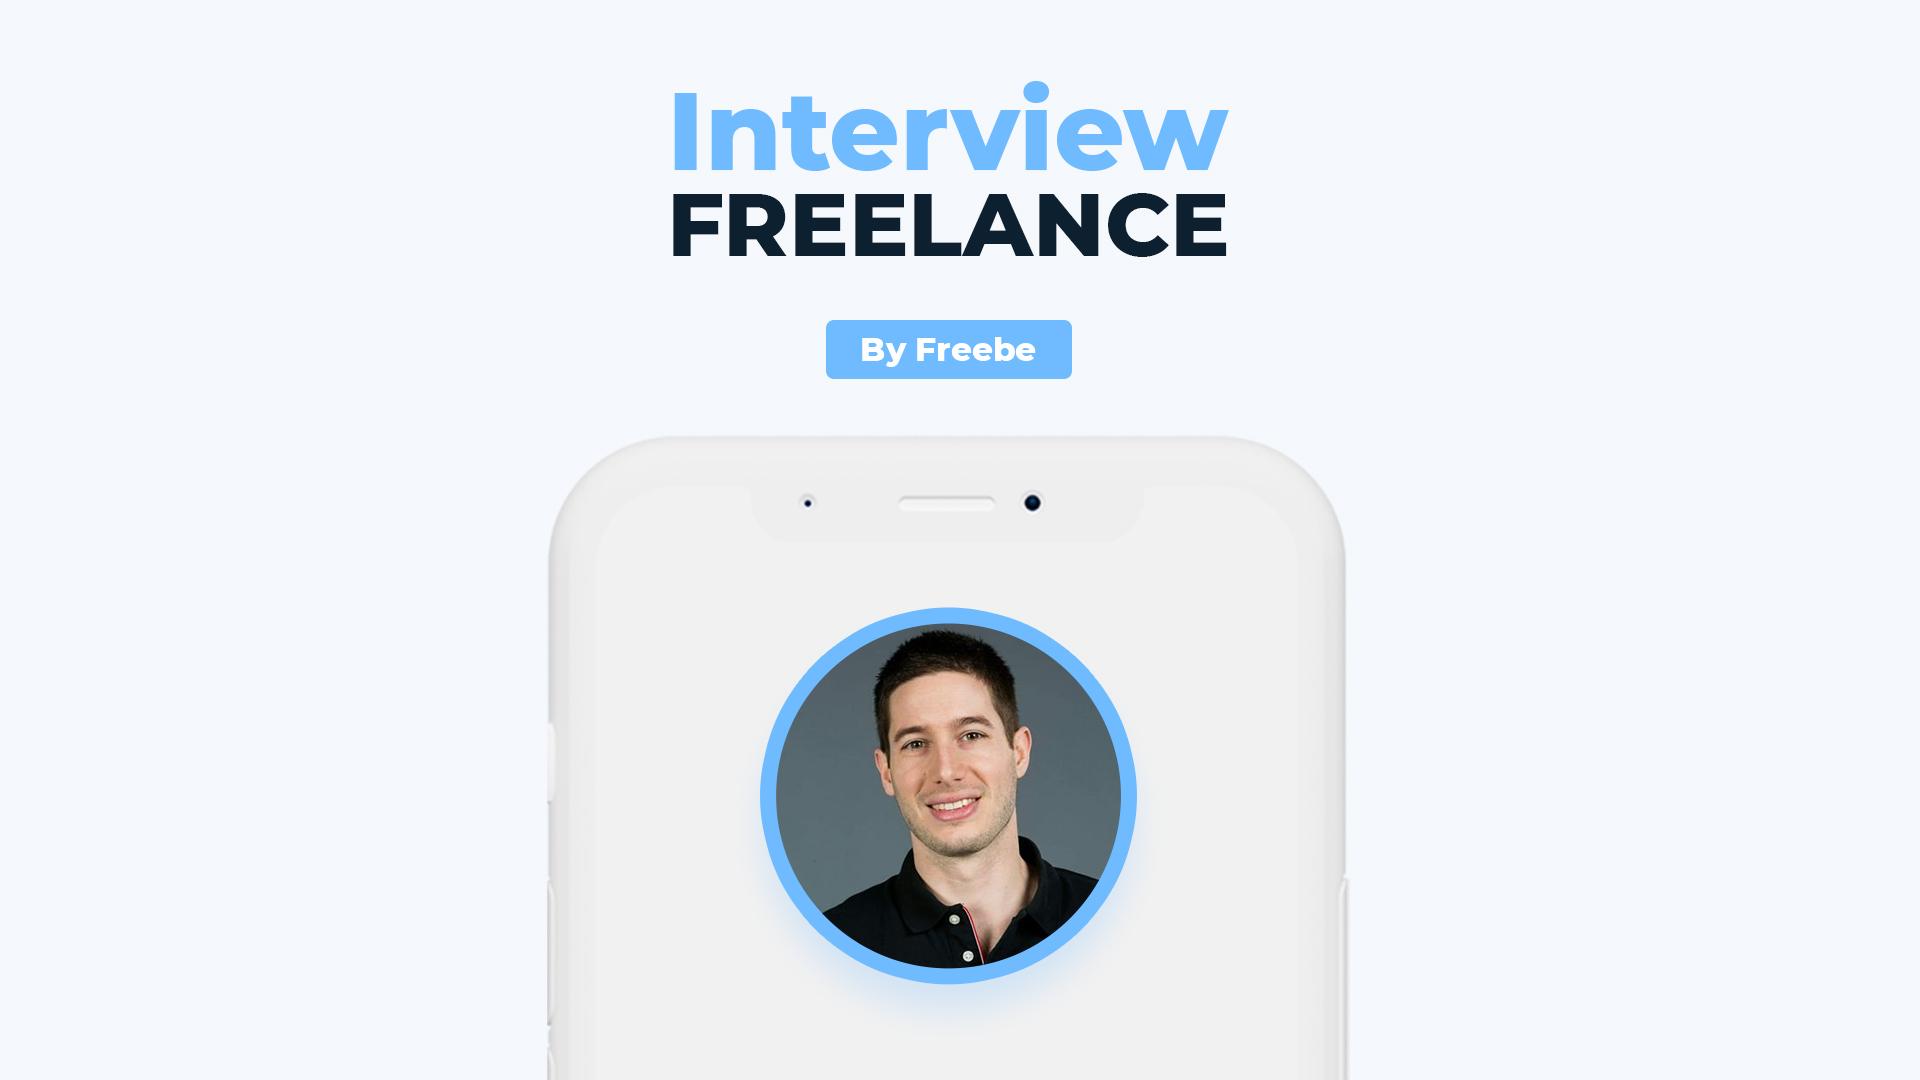 [Interview Freelance] Laurent Garrouste, fondateur de JUPDLC